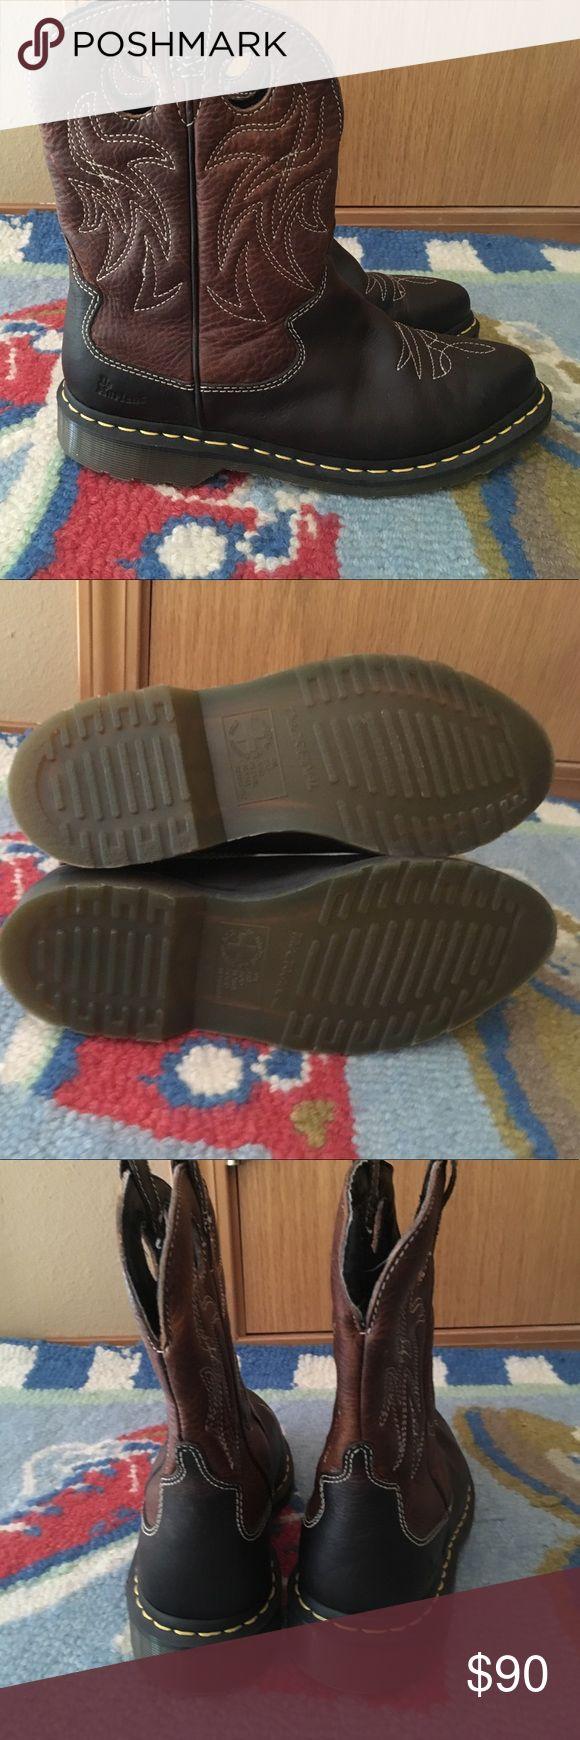 Dr. Martens cowboy short boot Brown leather with cowboy stitching. Size says 39 EU  -  8 US   L Dr. Martens Shoes